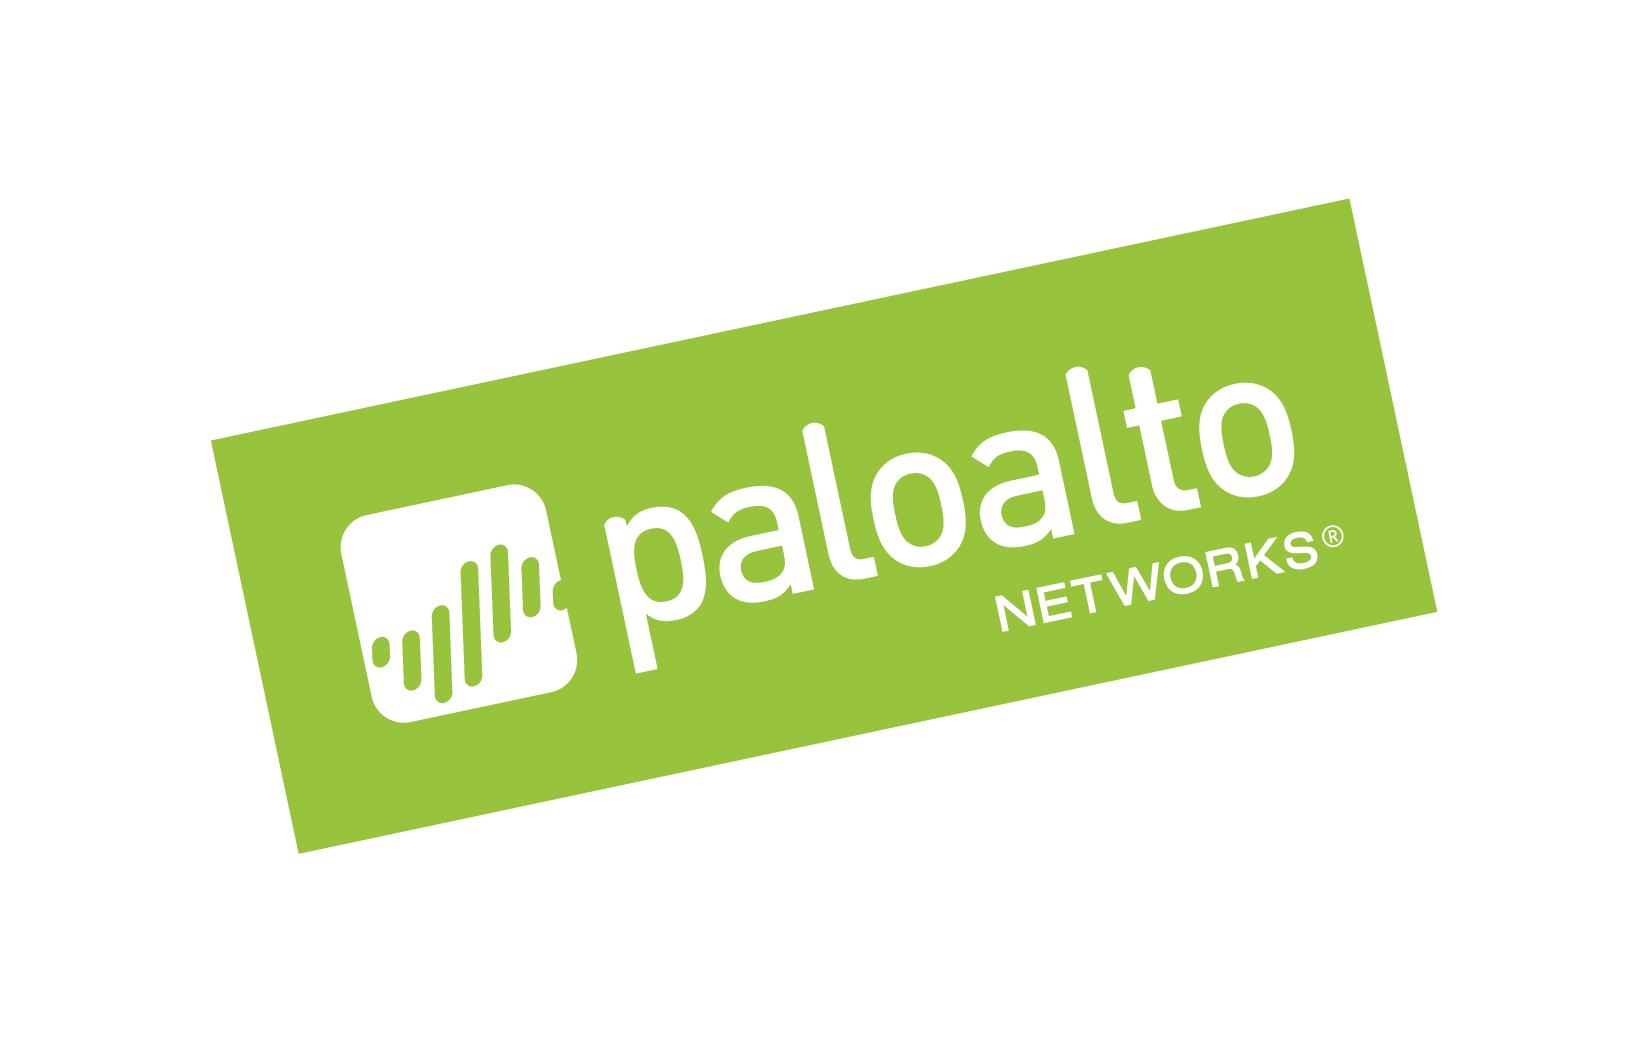 Palo Alto Networks logo (PRNewsFoto/Palo Alto Networks, Inc.)